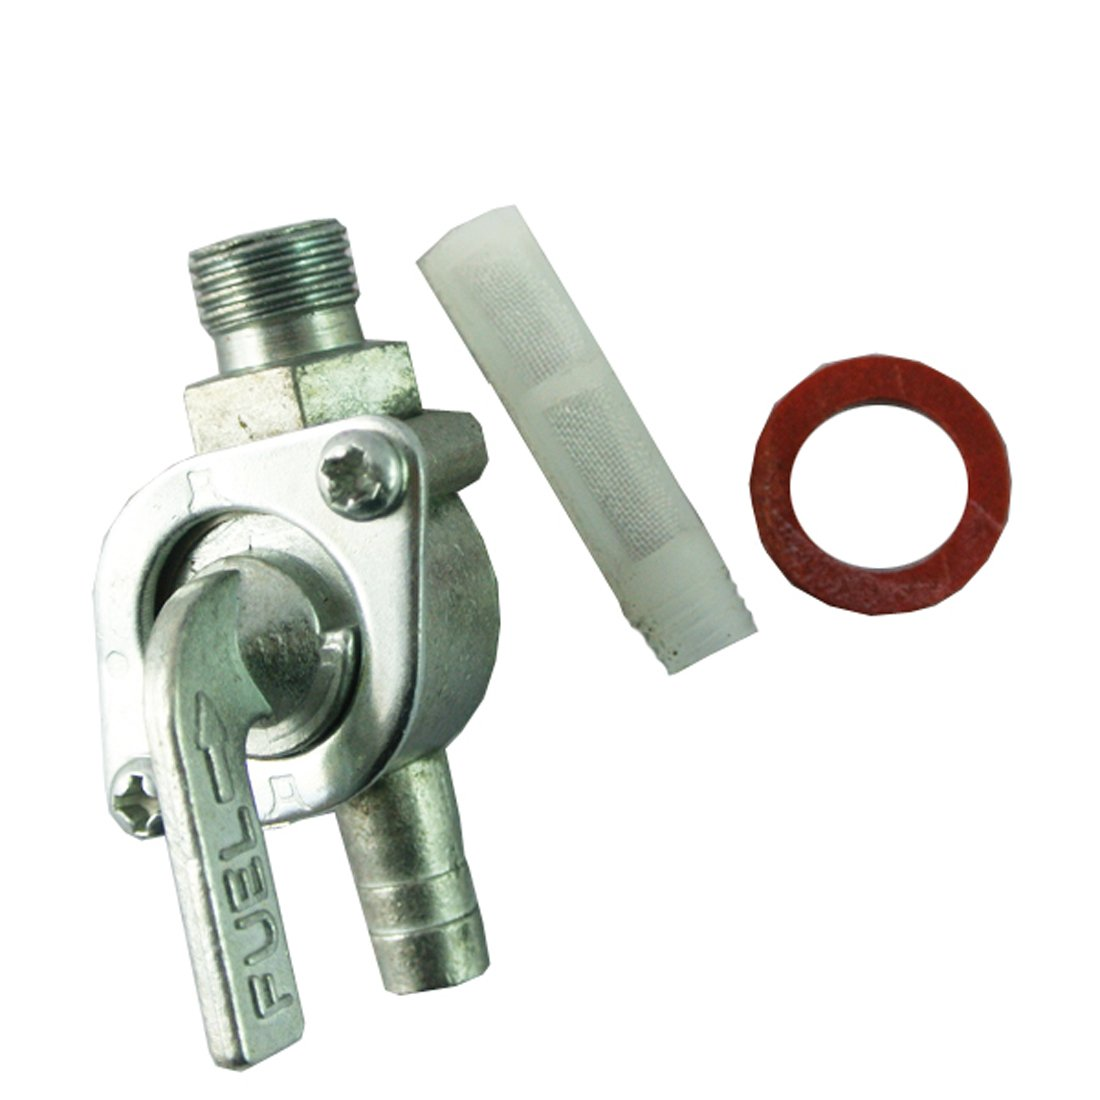 10 Teeth Clutch Drive Gear JRL Engine Motor Kit For 2-Stroke 80Cc Motorized Bicycle